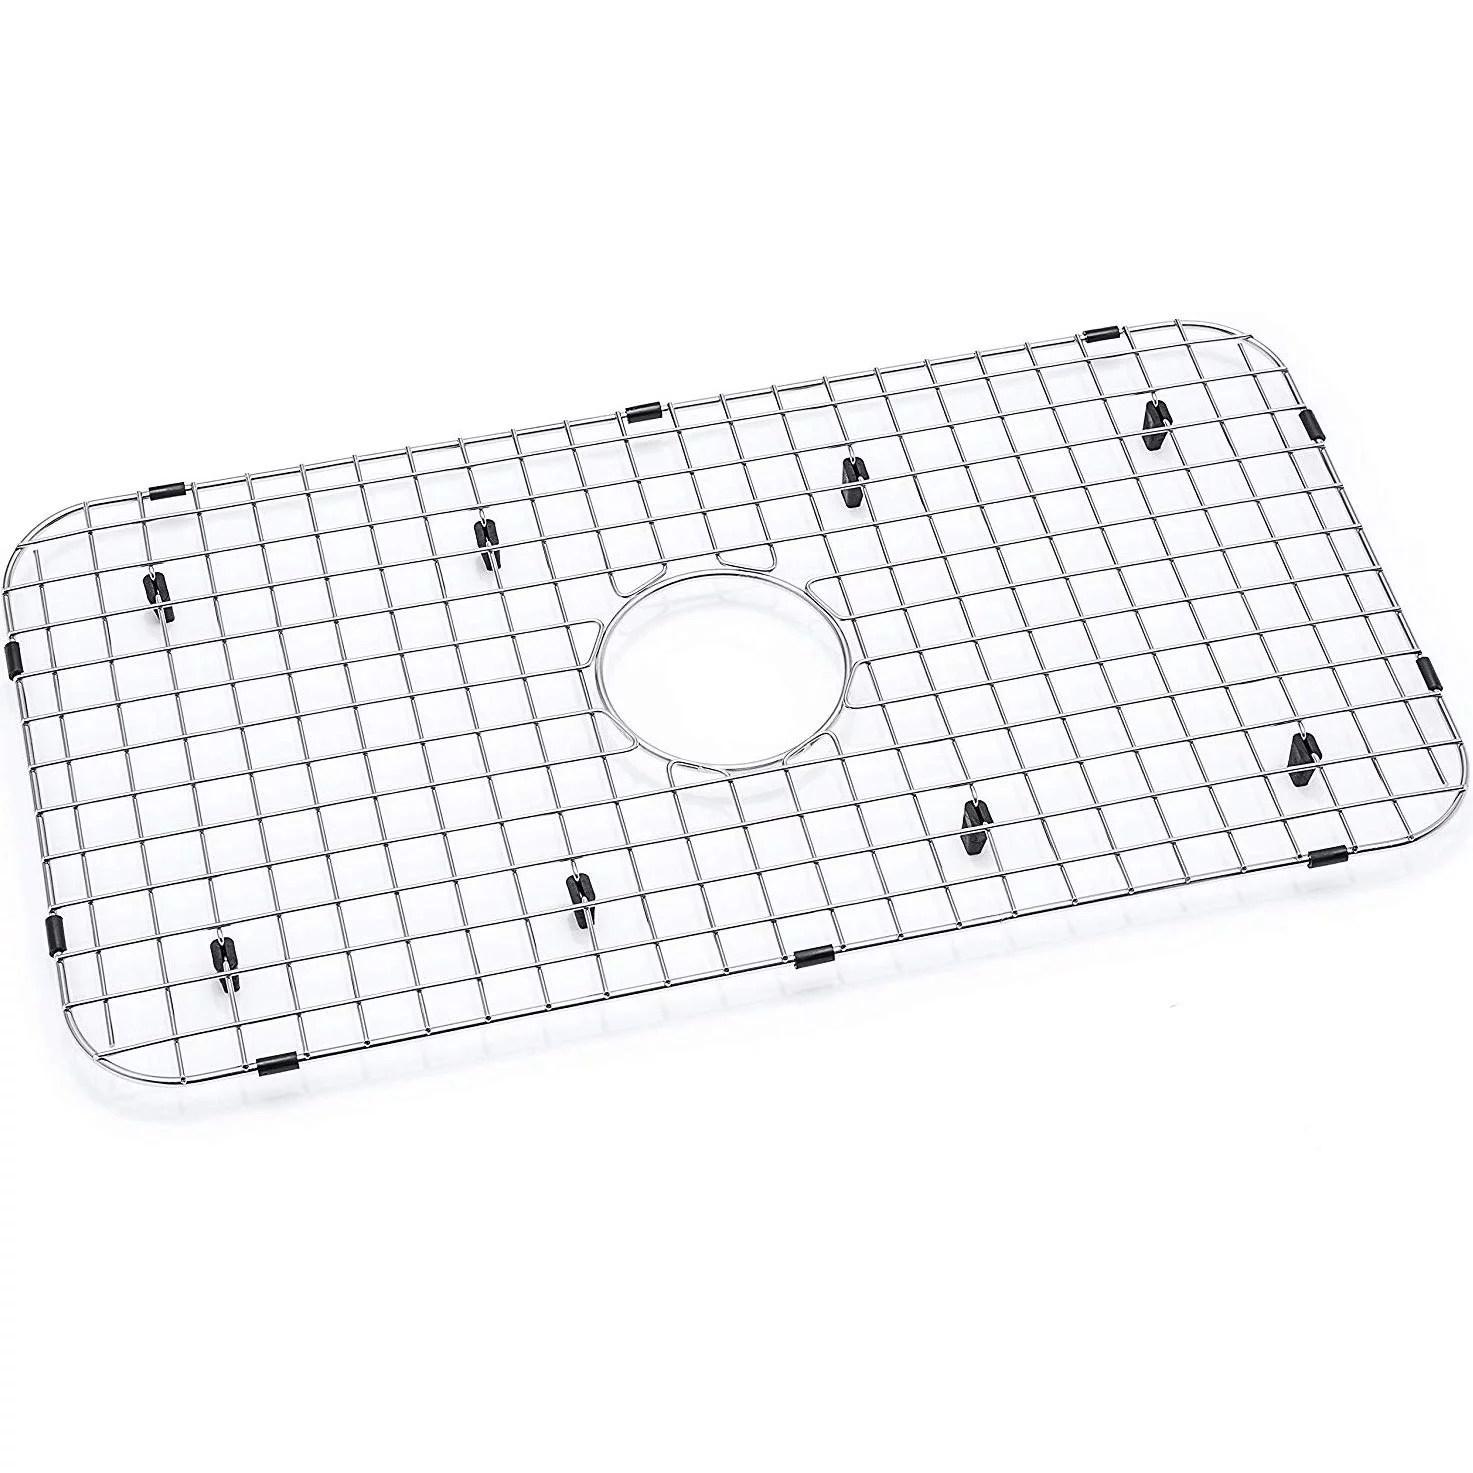 kitchen sink grid premium sink bottom grid stainless steel sink size minimum 27 1 4 x 14 1 4 protect your sink from scratches